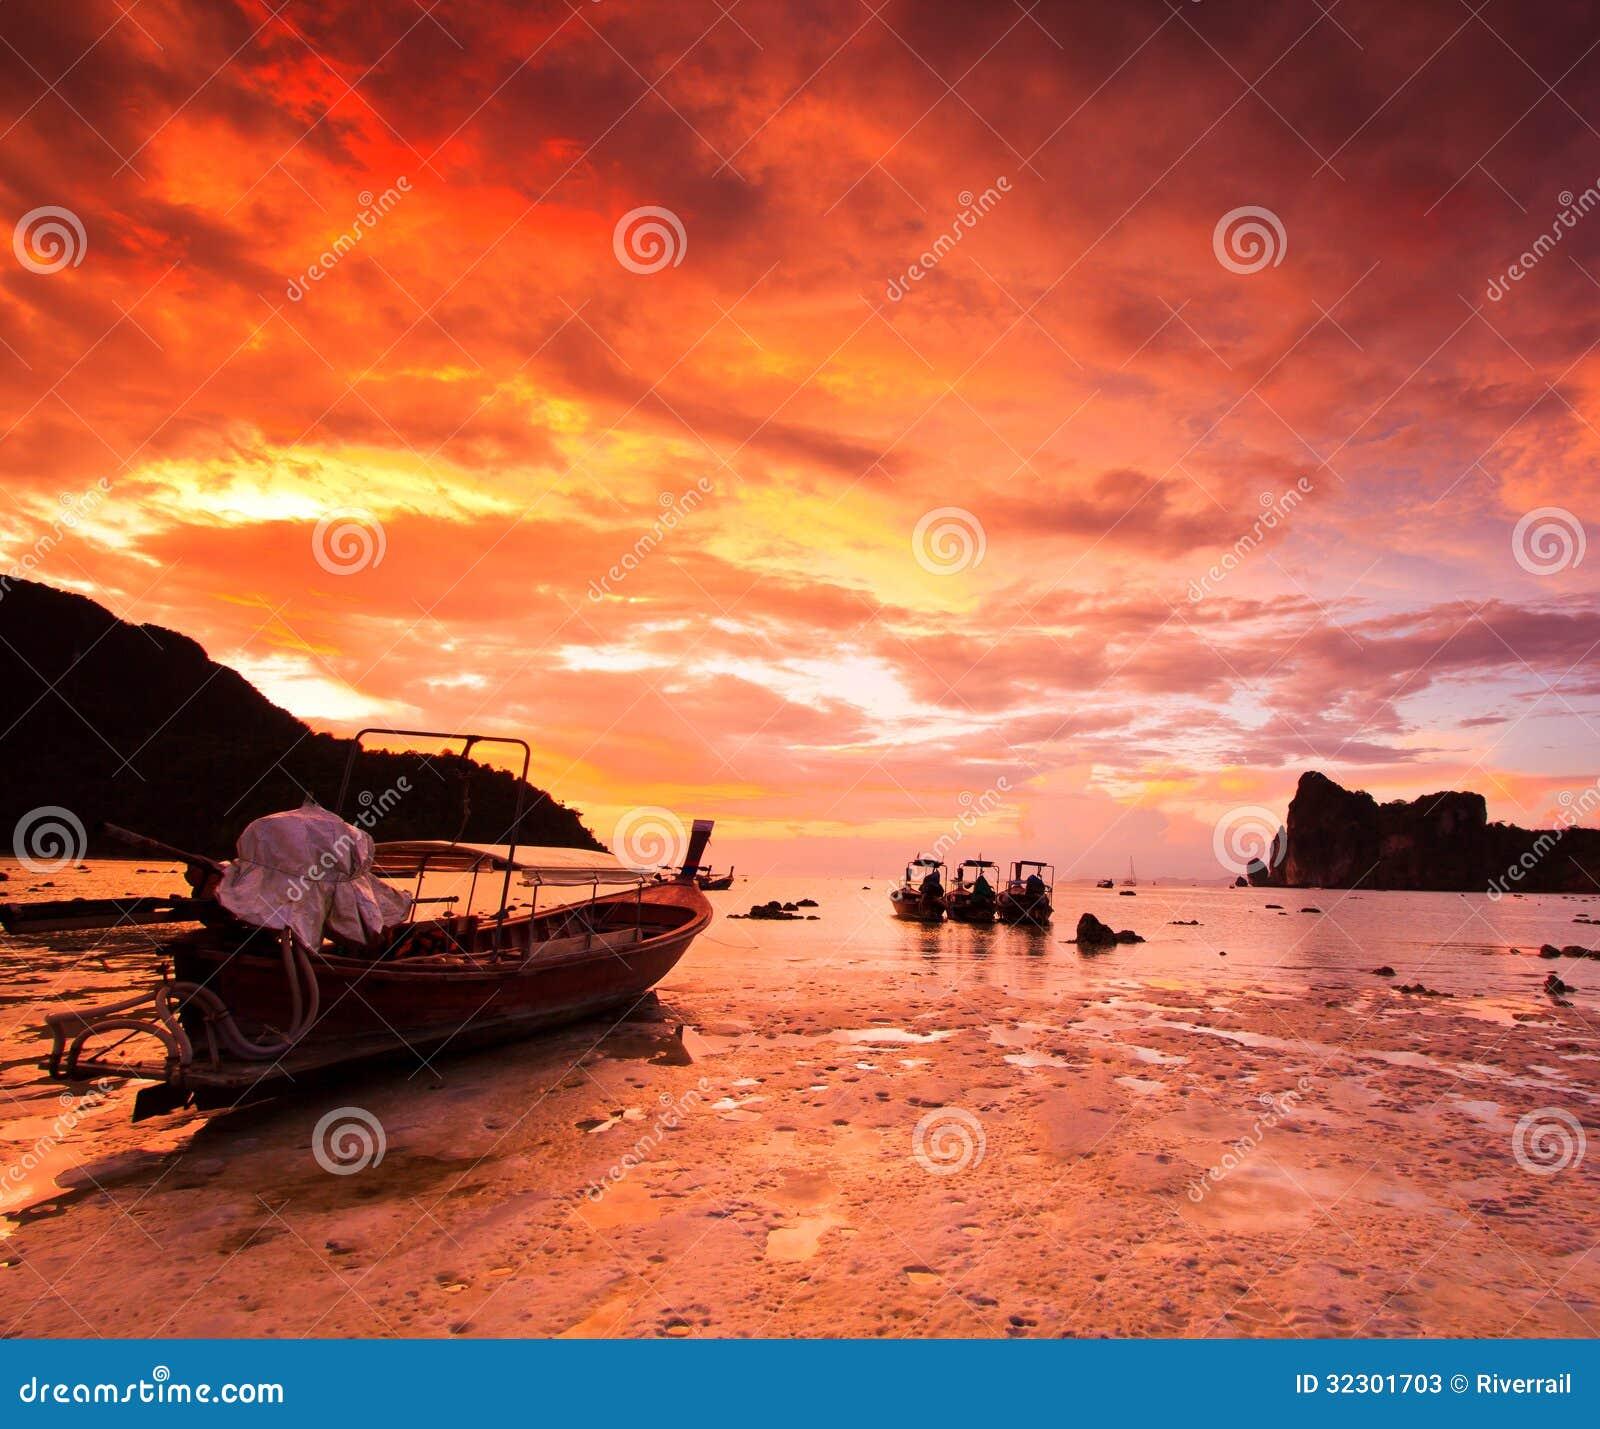 sunset sailing boats rocks - photo #6